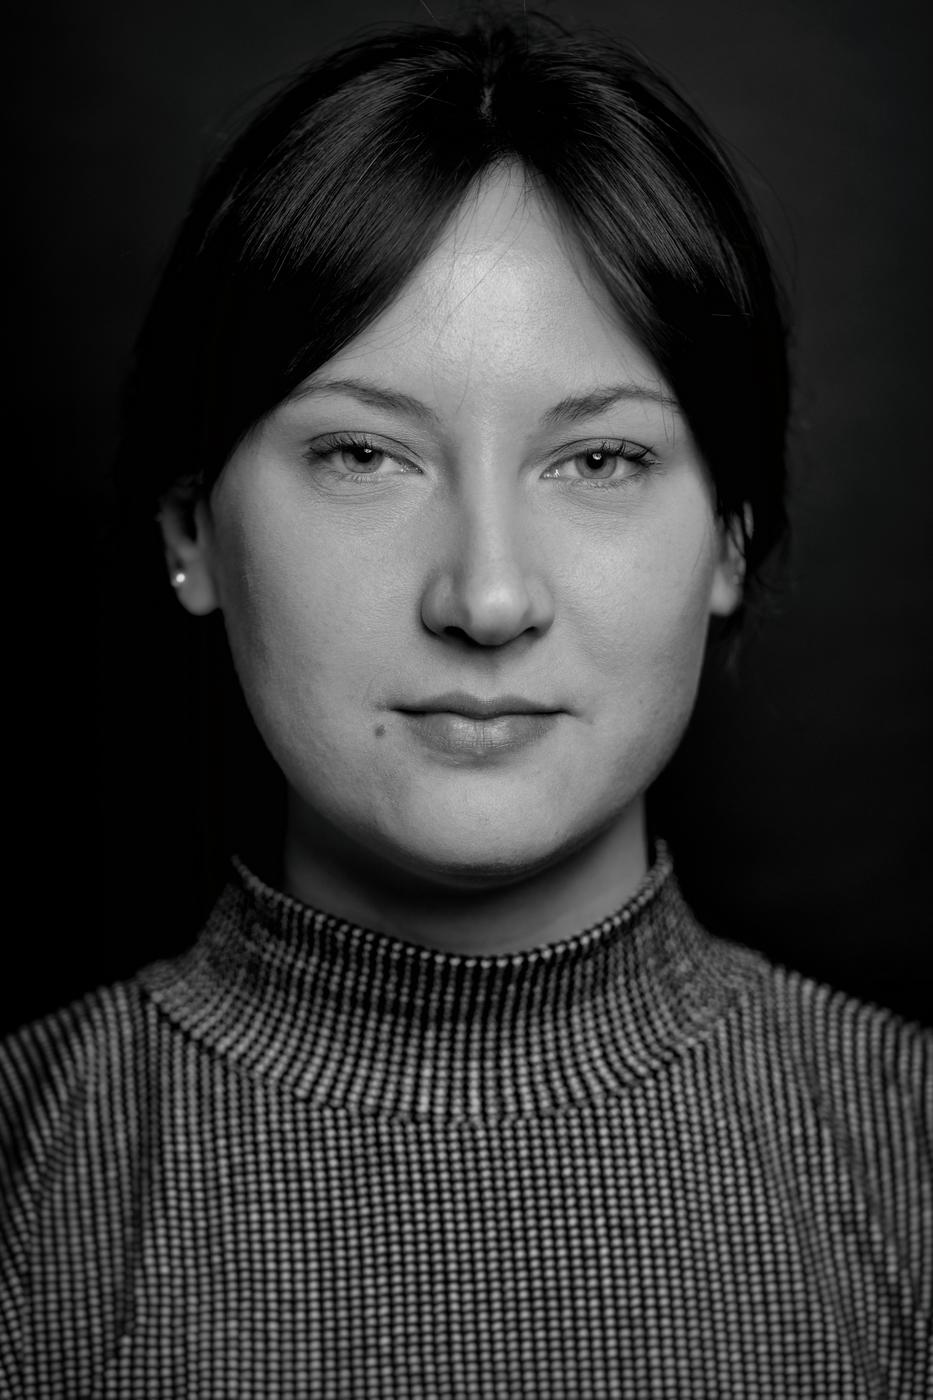 Photographe-portraitiste